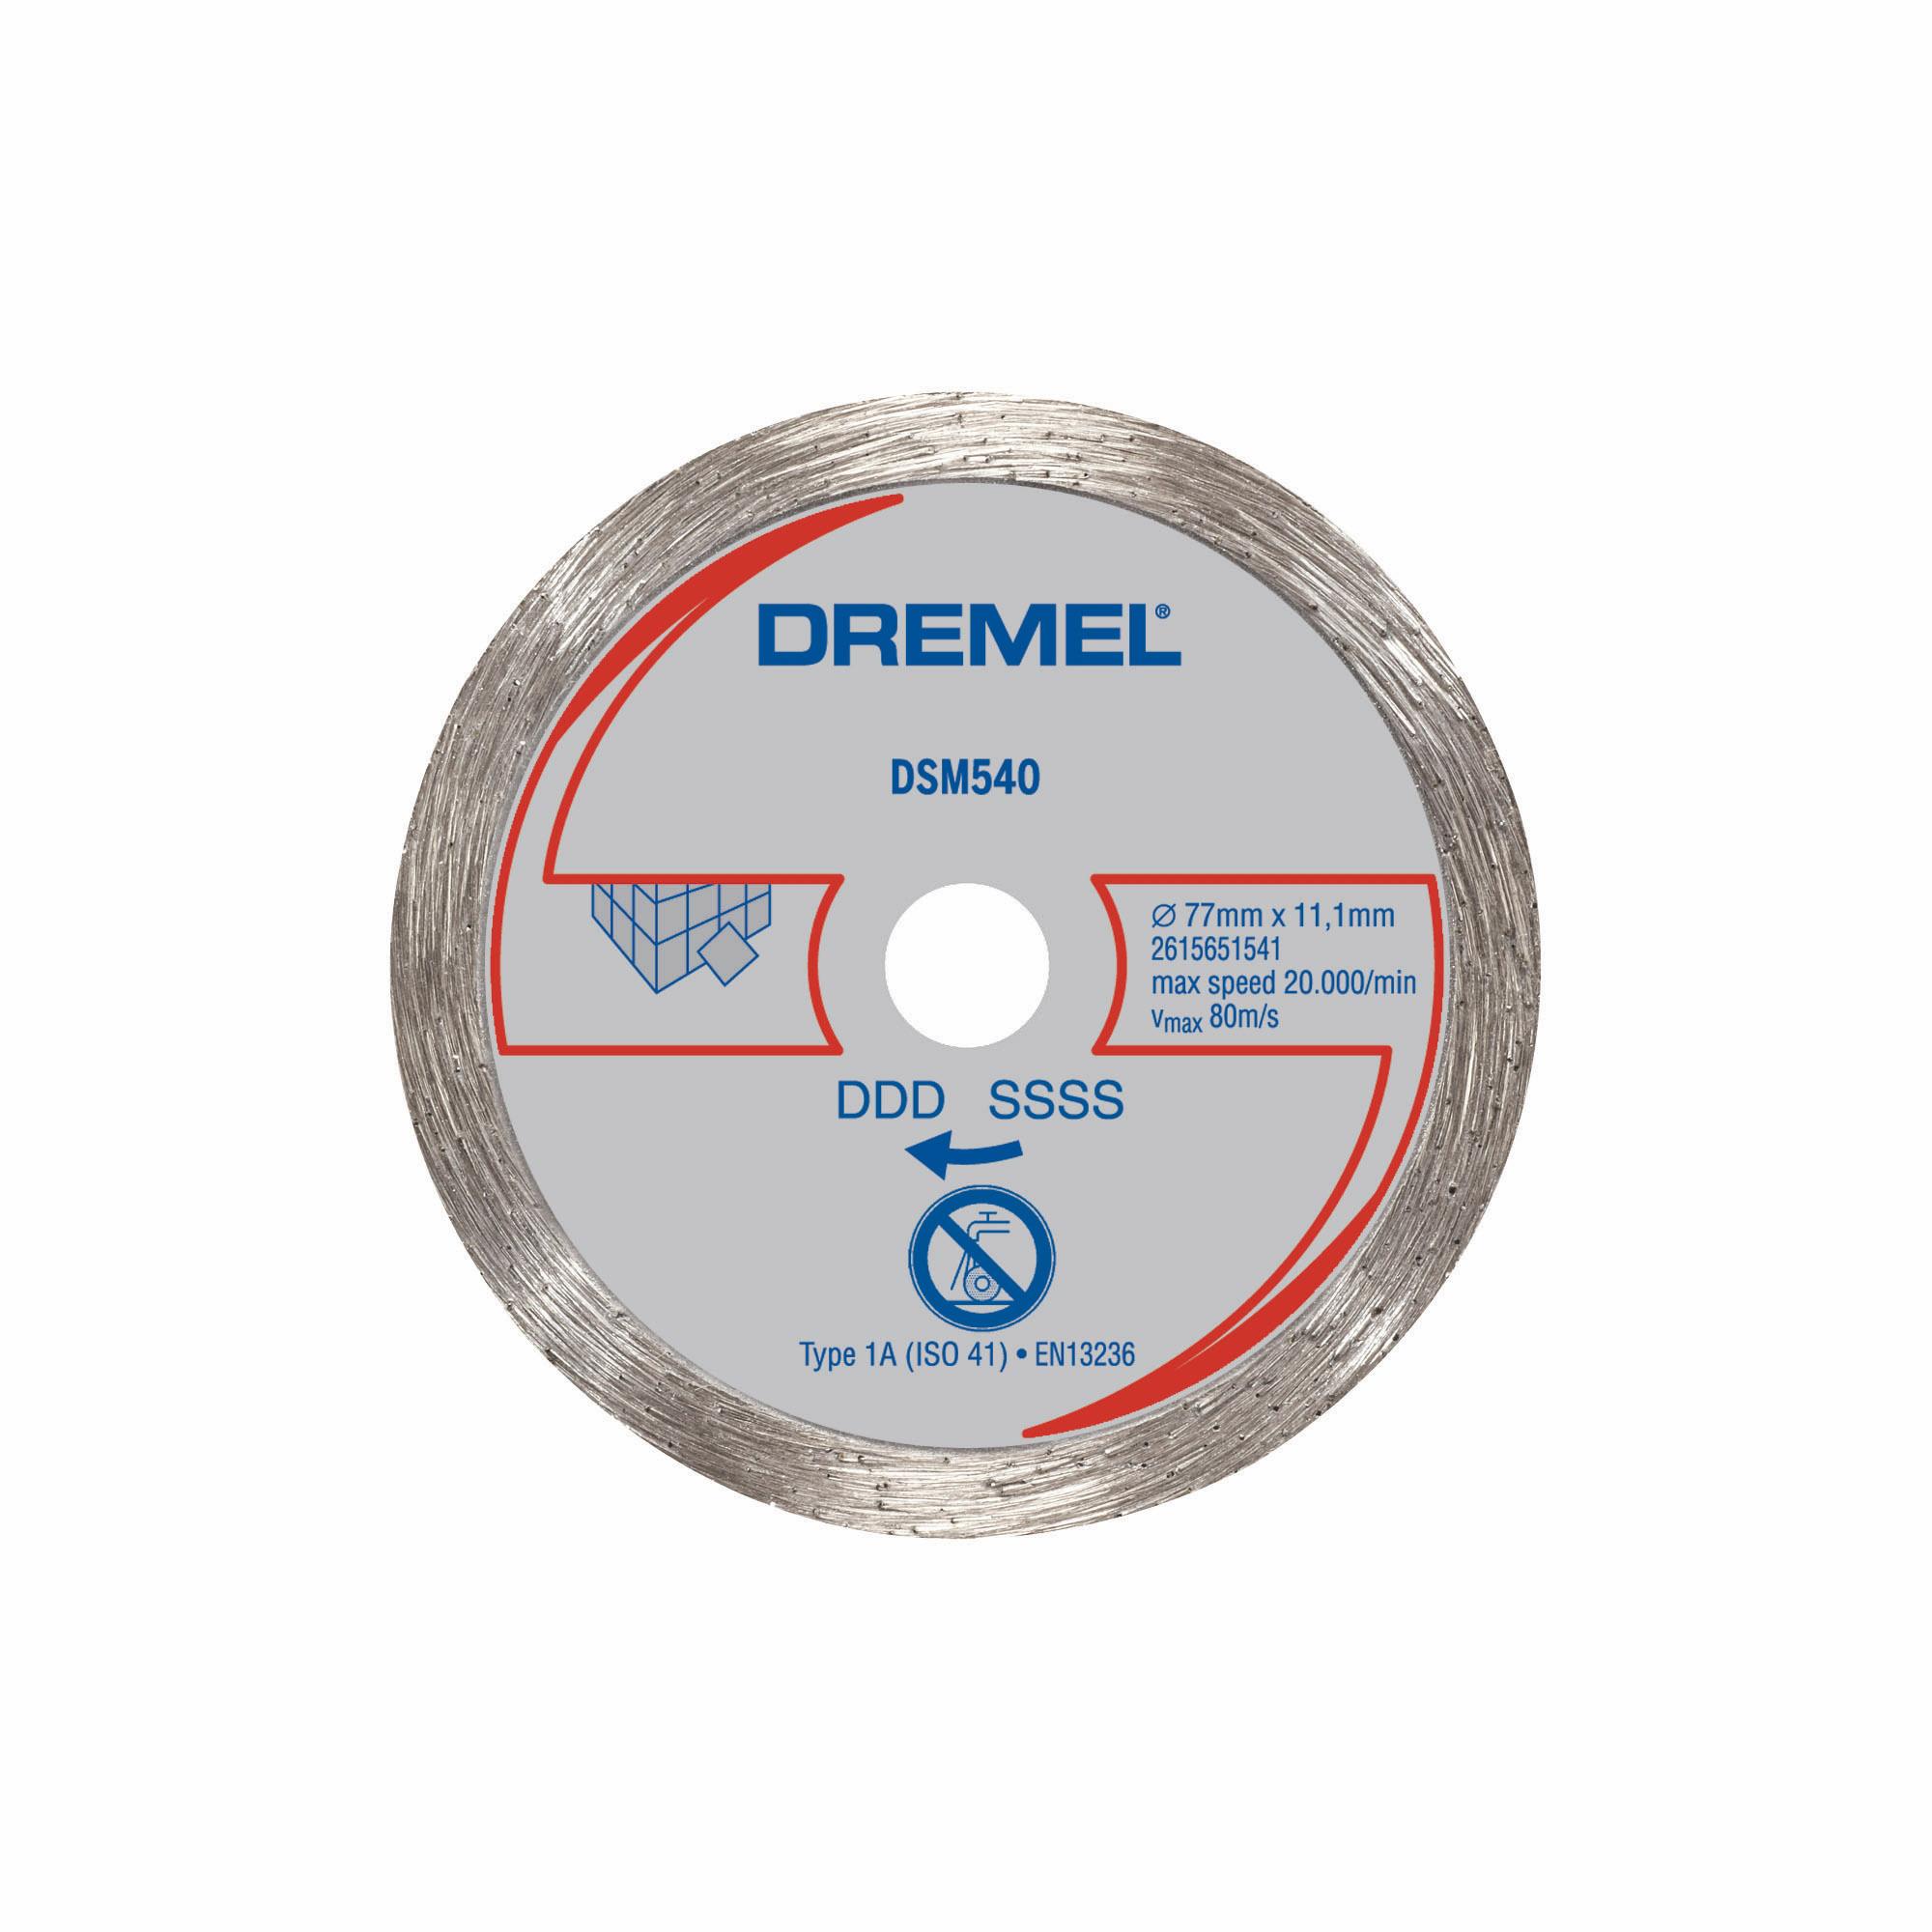 Dremel Sm540 3 Inch Heavy Duty Multi Purpose Tile Diamond